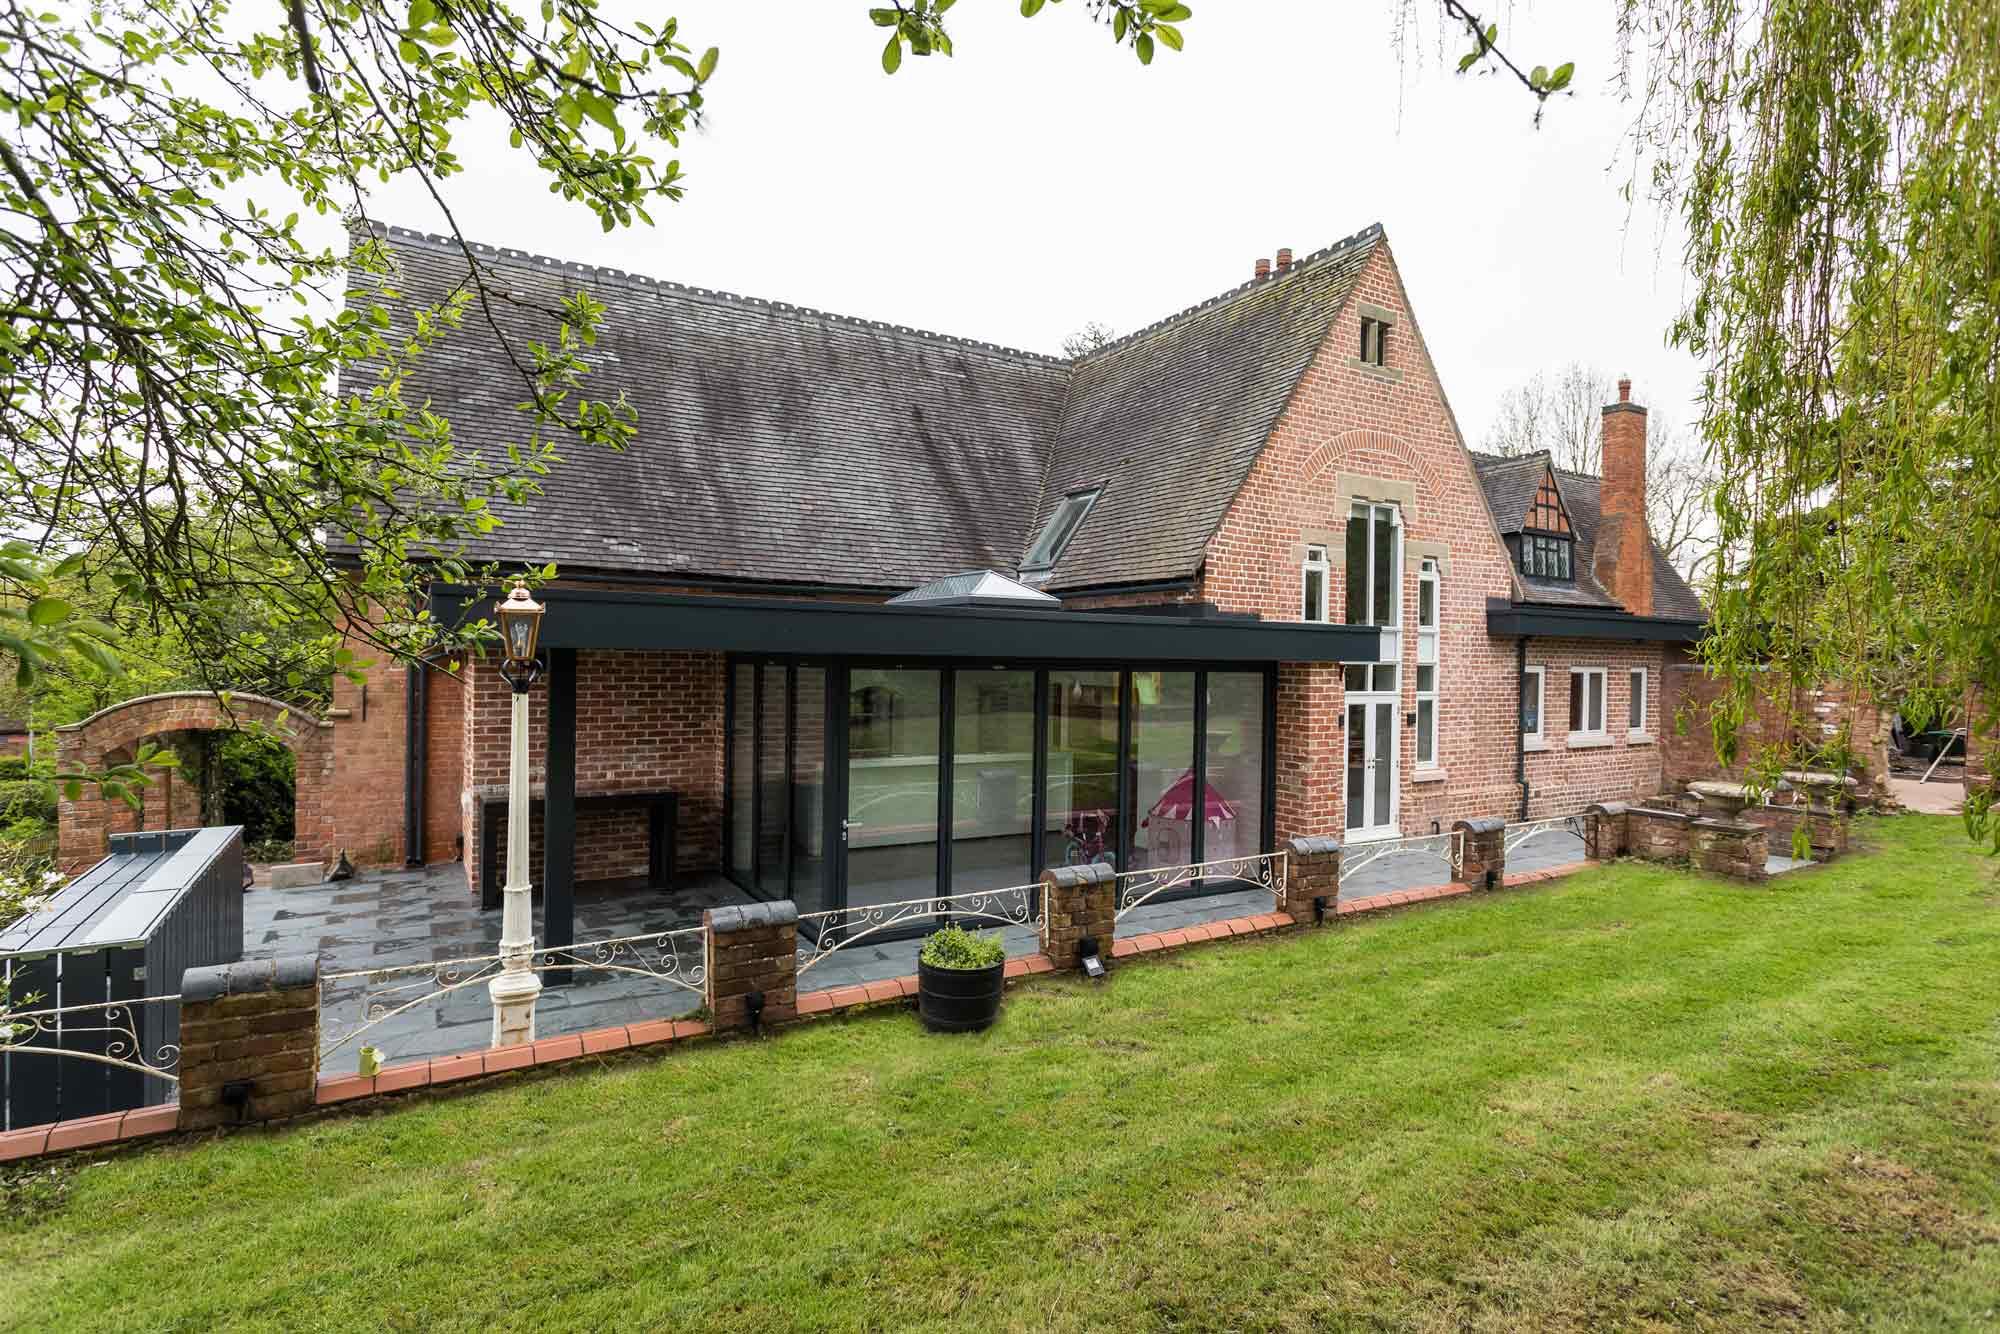 flat roof extension overhang canopy bi-folding doors, Victorian lantern